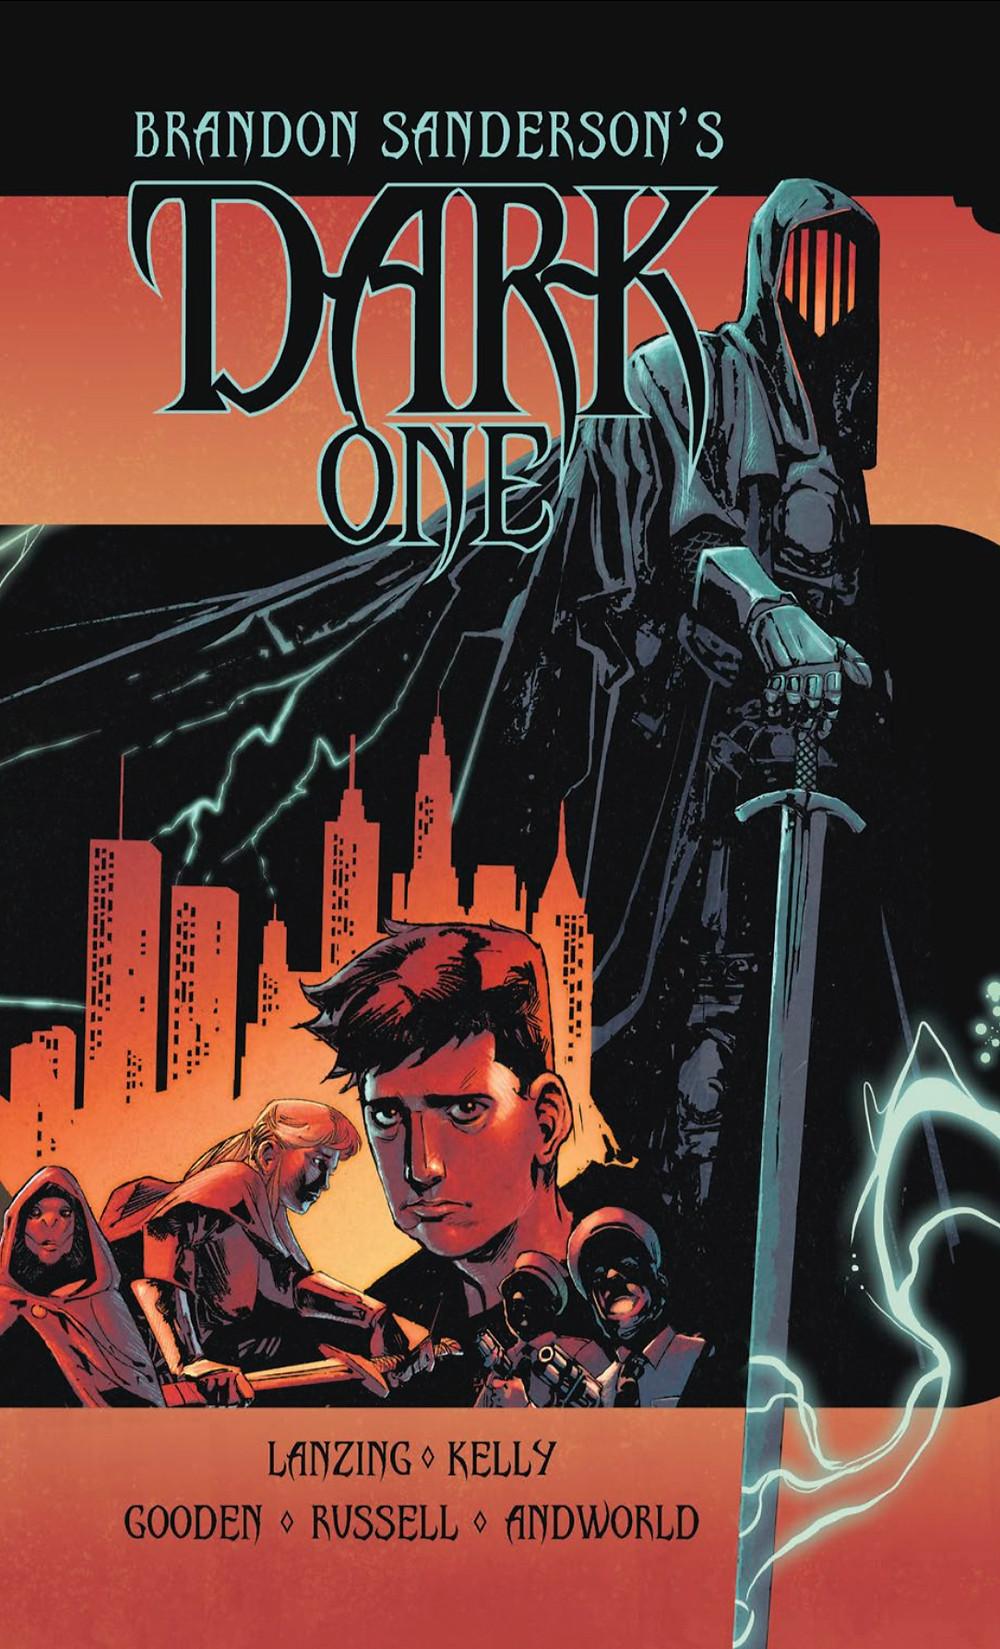 Dark One, Vol. 1, cover, Vault, Sanderson/Lanzing/Kelly/Gooden